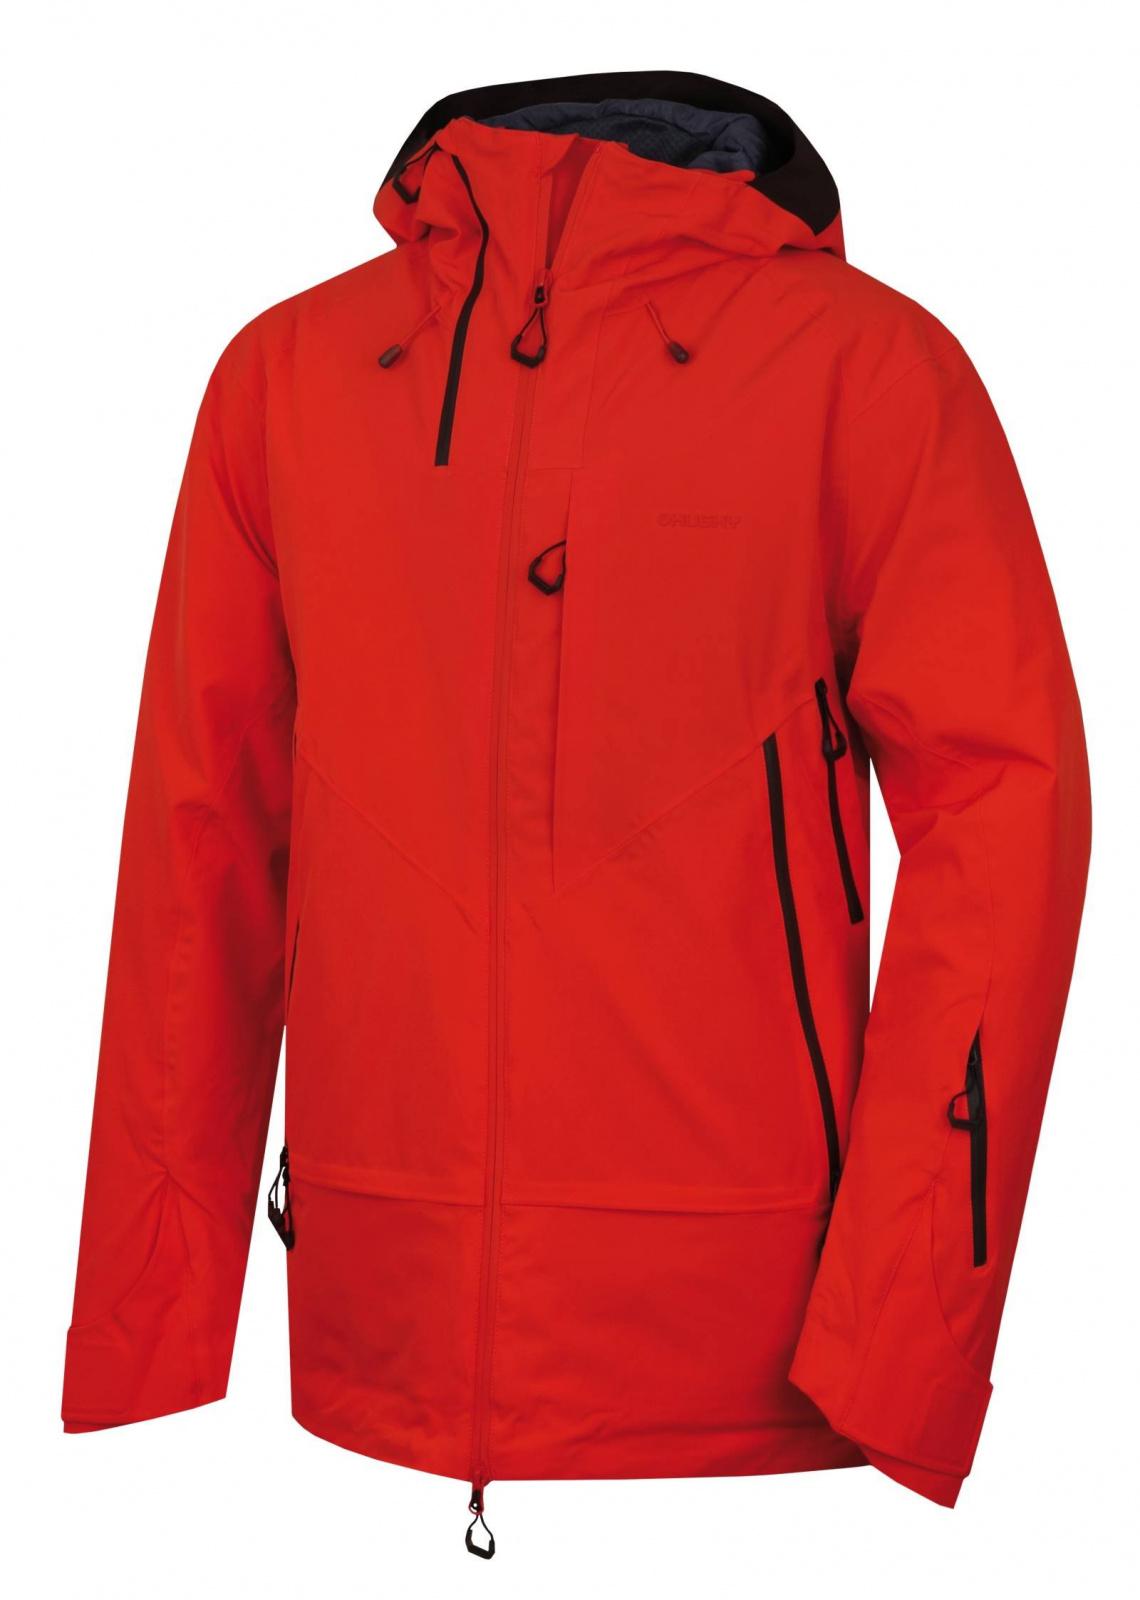 Husky Gambola M výrazne červená, XL Pánska hardshell bunda